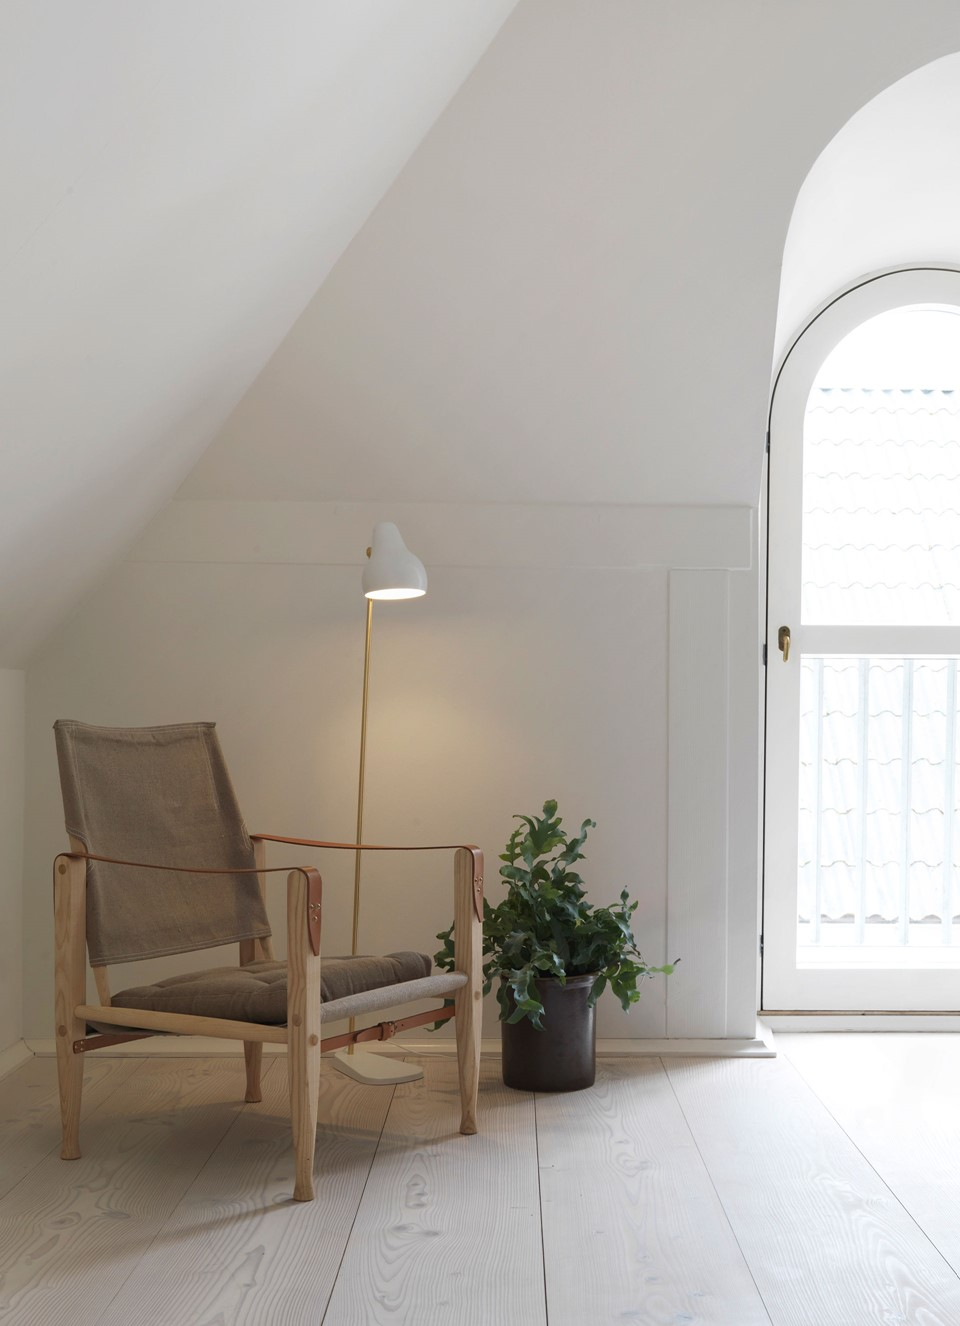 douglas fir floor lye white soap underfloor heating chair dinesen country home.jpg